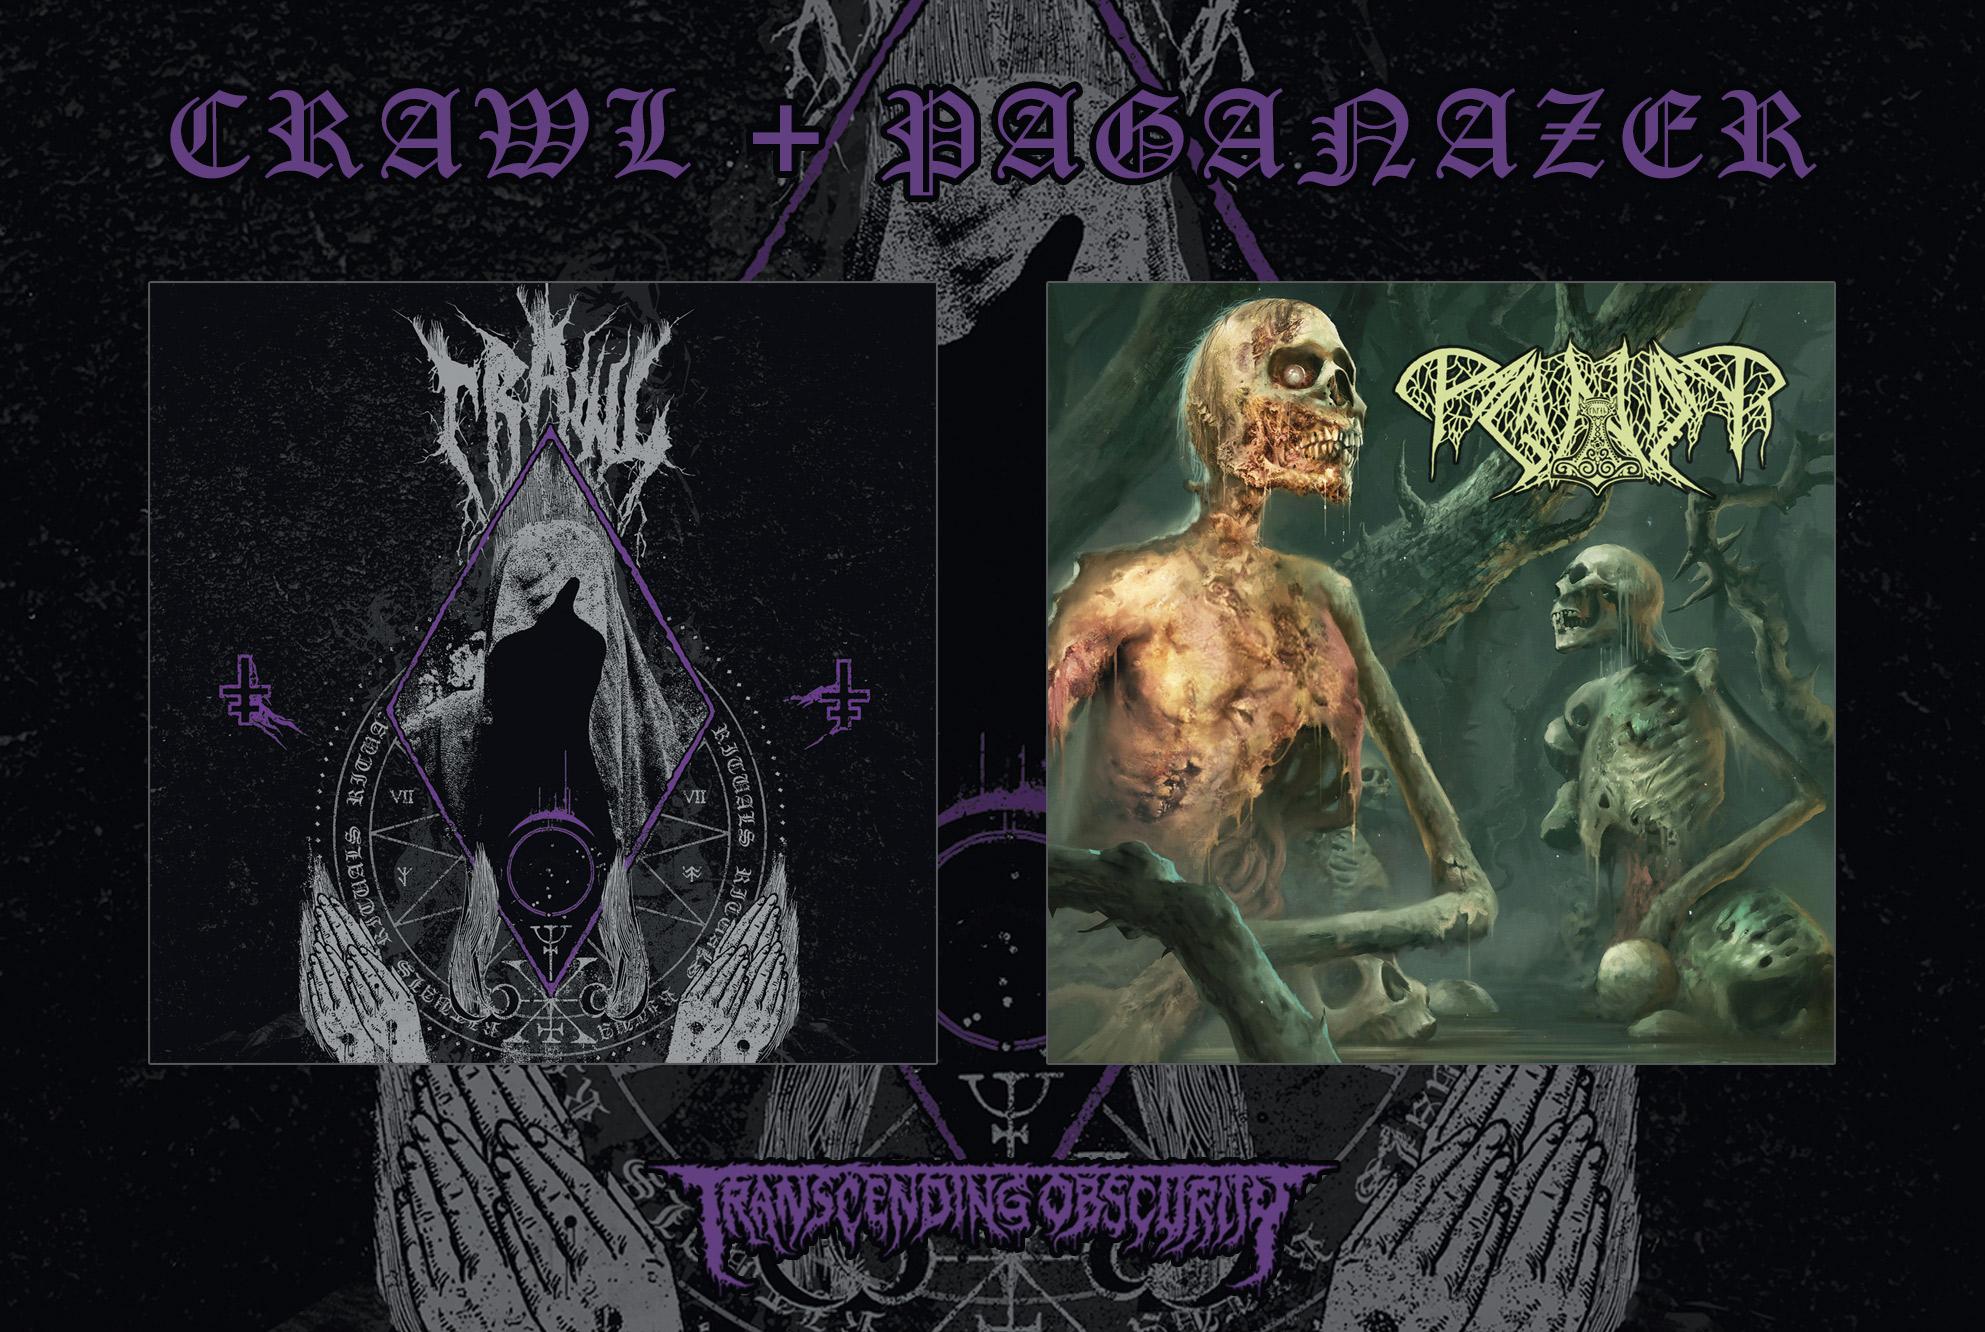 Swedish Death Metal Special - CRAWL + PAGANIZER 2-CD Combo